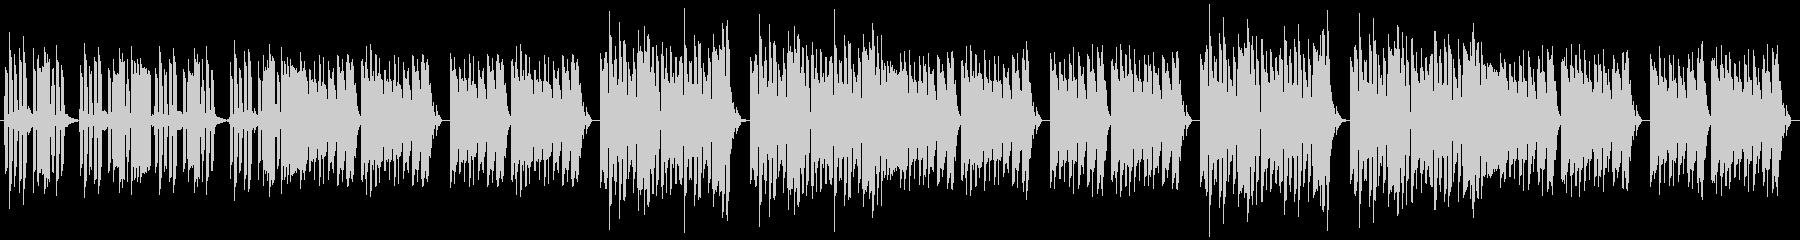 Loose / Animal / Kids / Comical / Recorder's unreproduced waveform